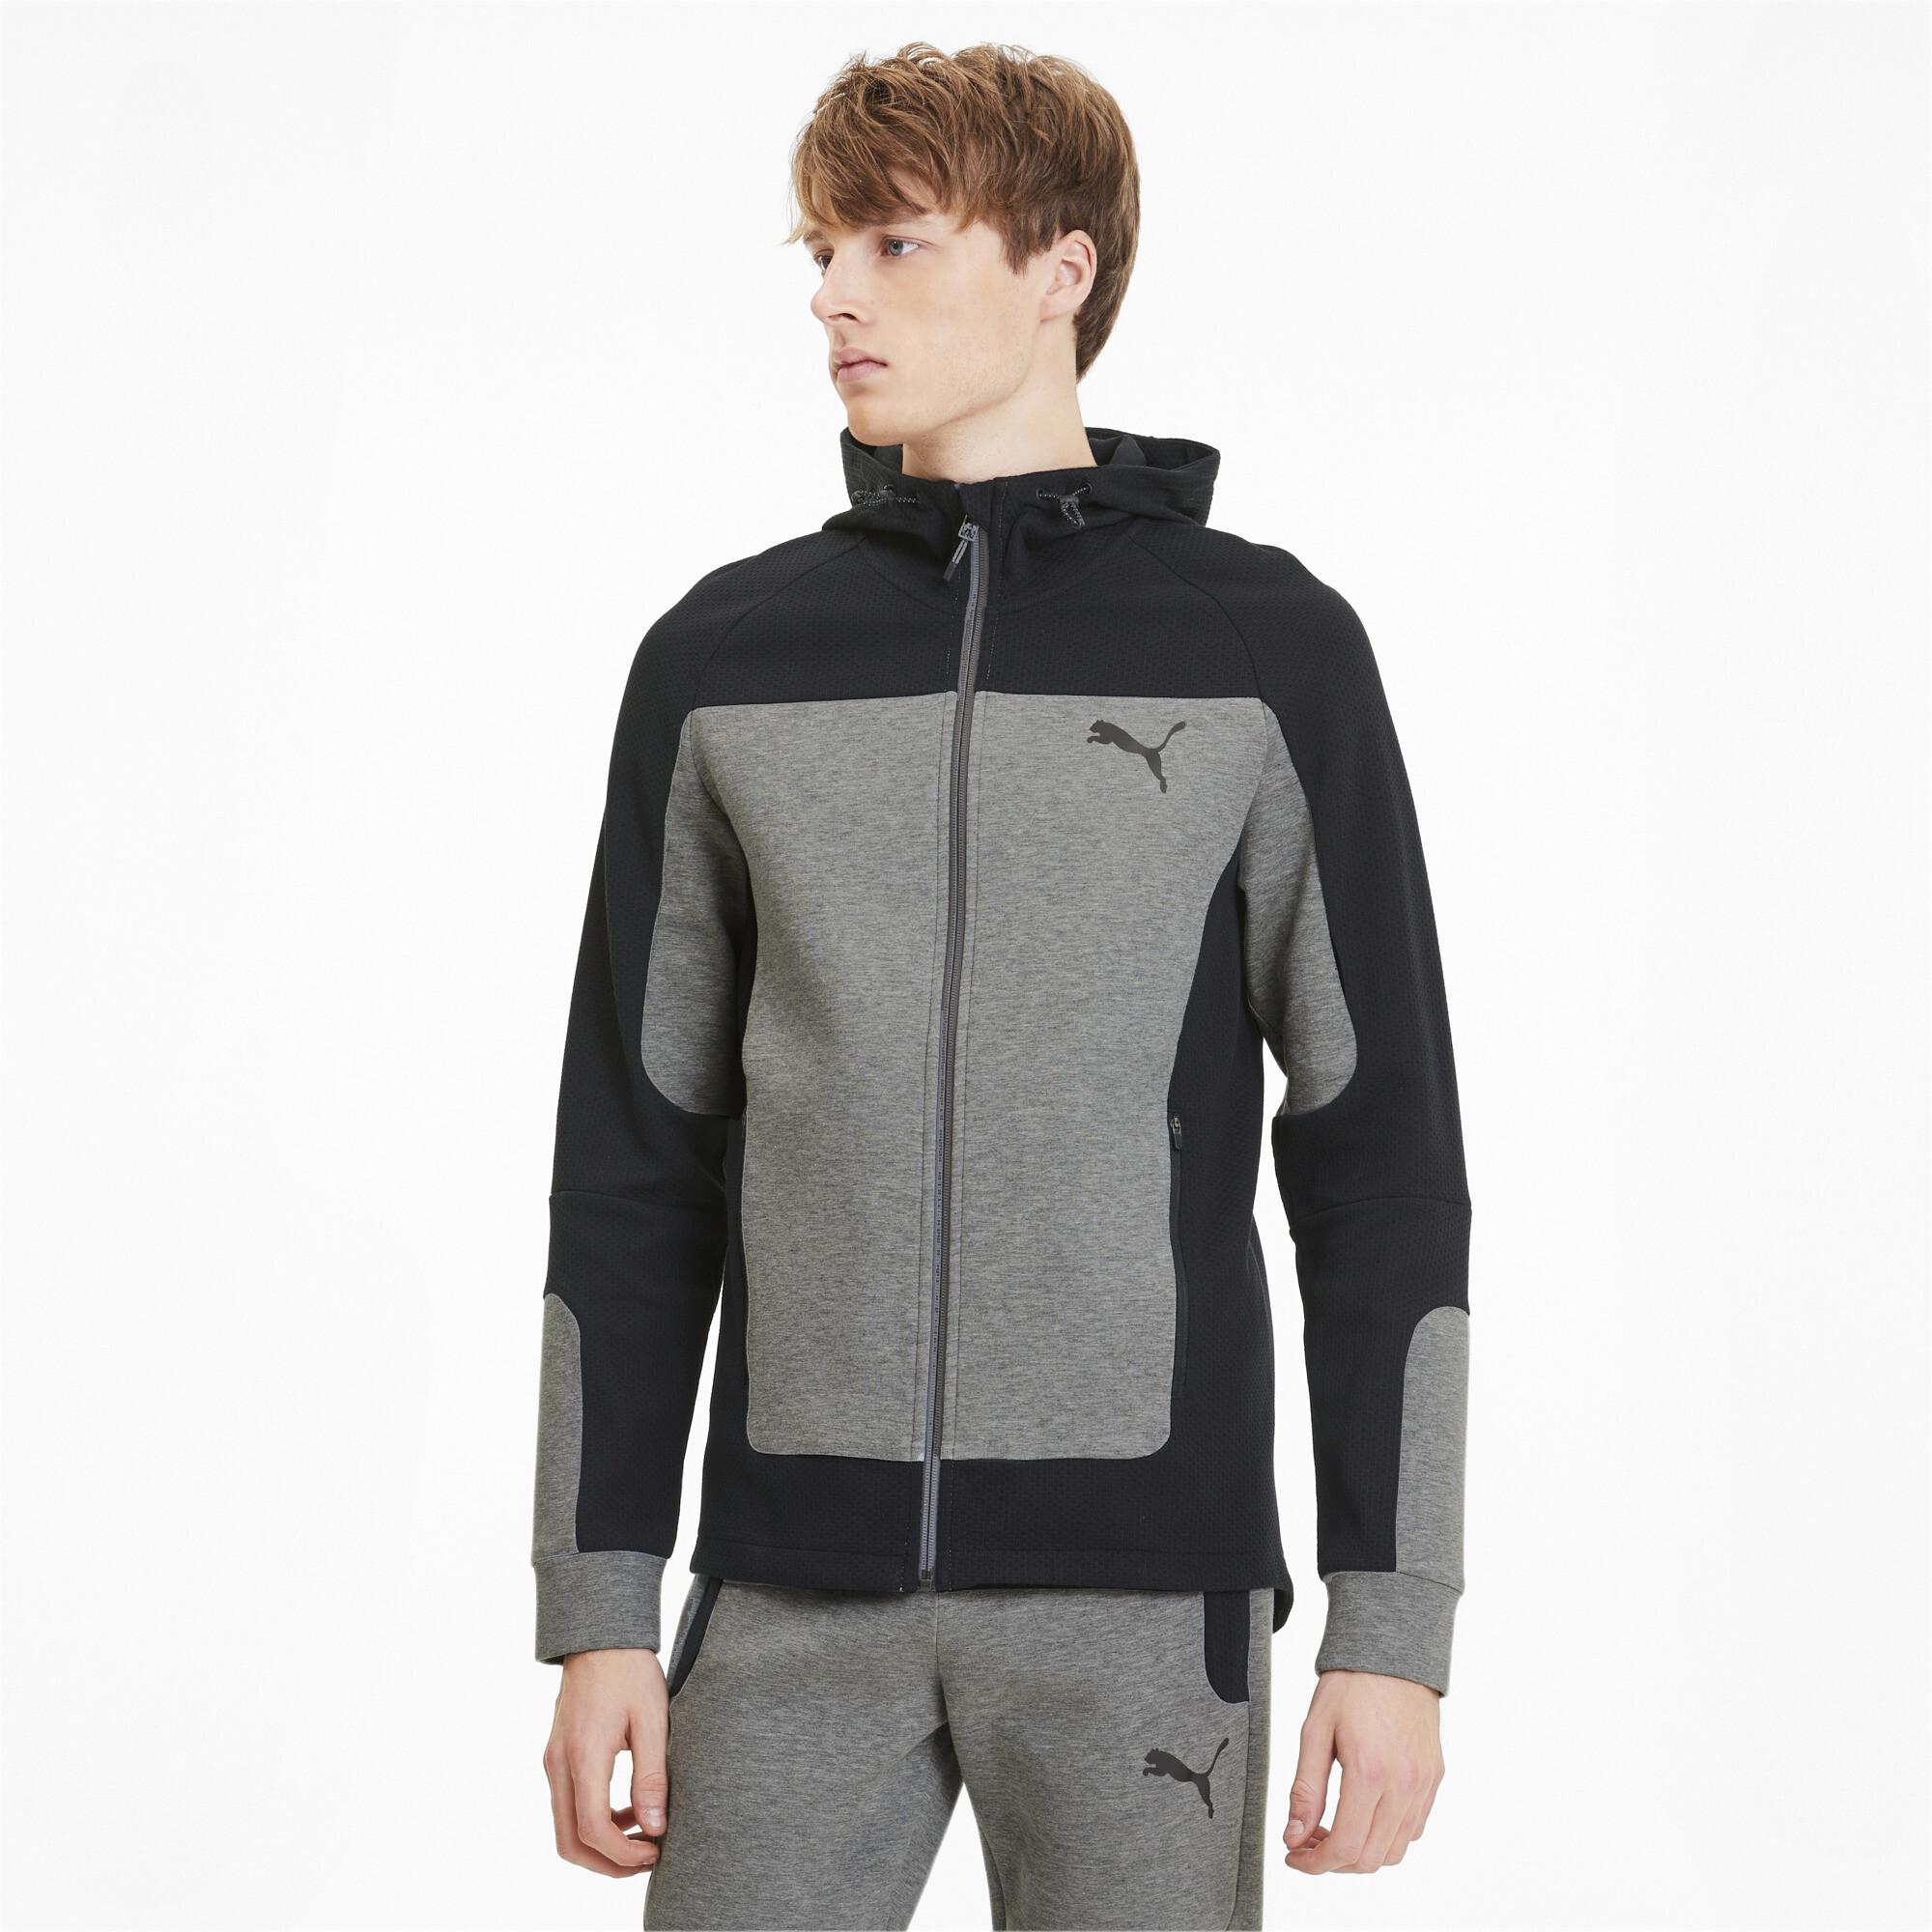 PUMA-Evostripe-Men-039-s-Hooded-Jacket-Men-Sweat-Basics thumbnail 19